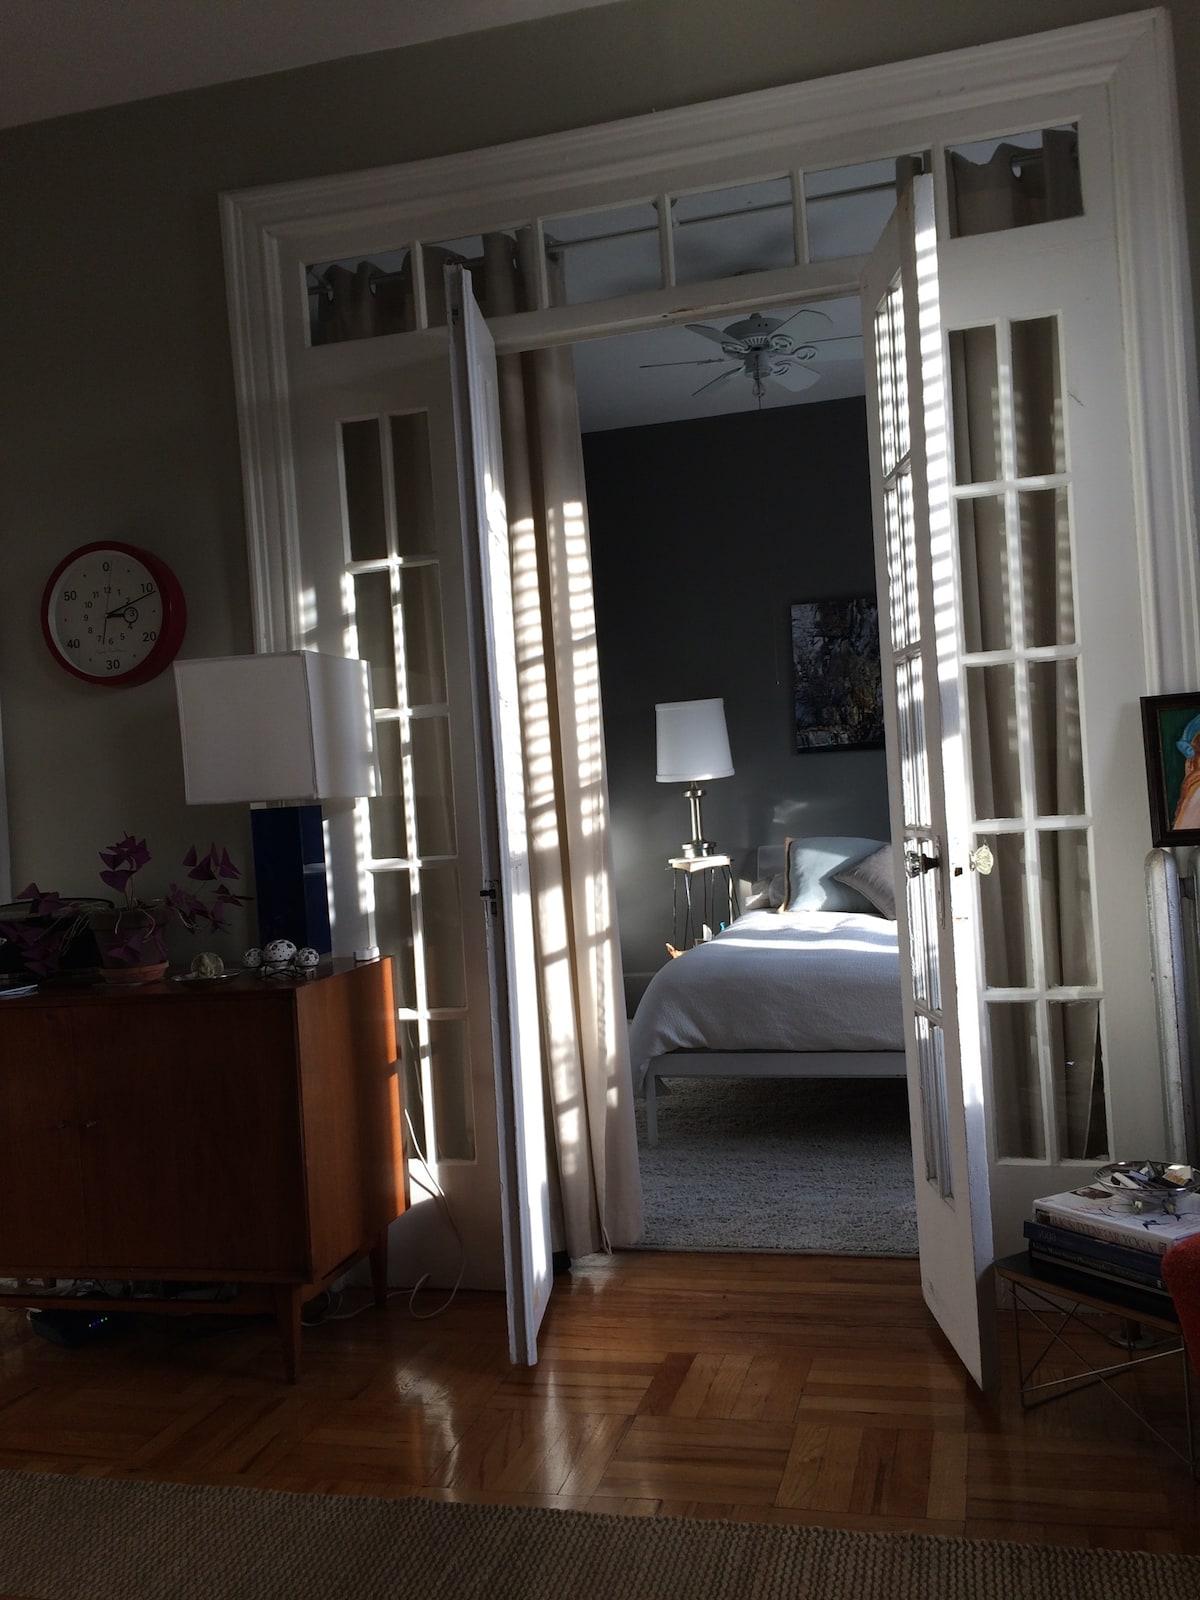 Cozy bedroom awaits you